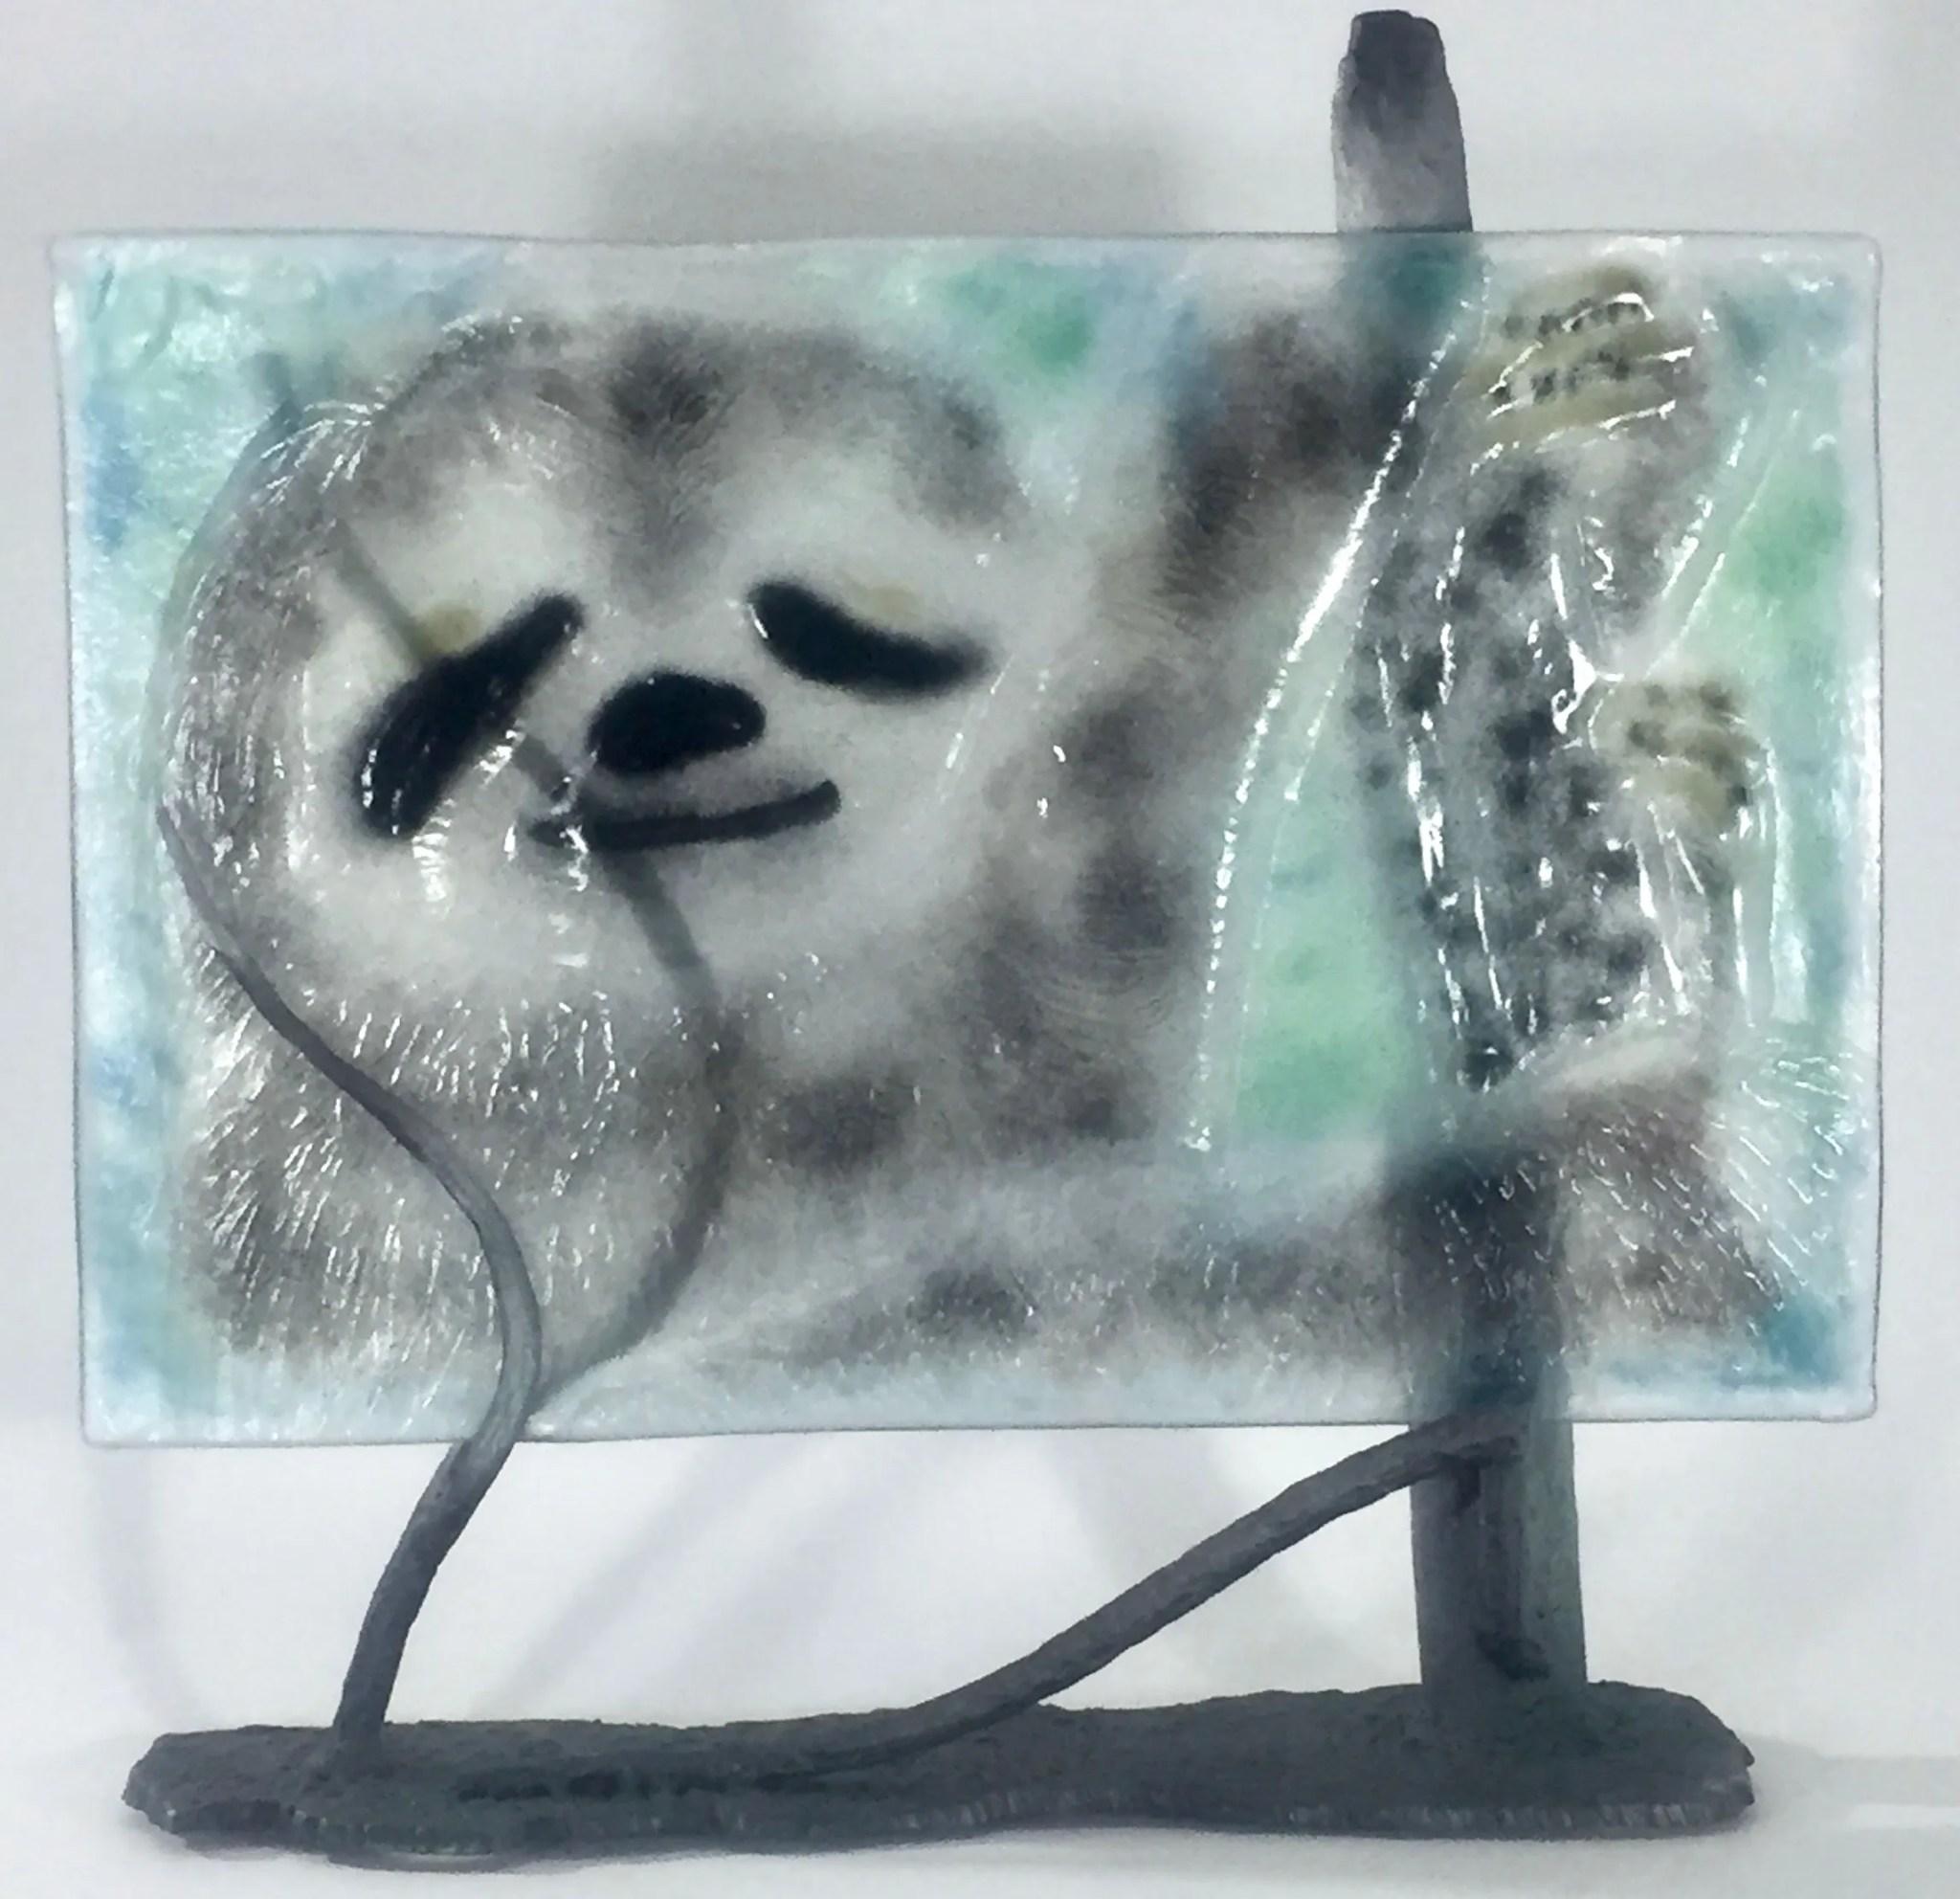 Sloth by Dori Settles